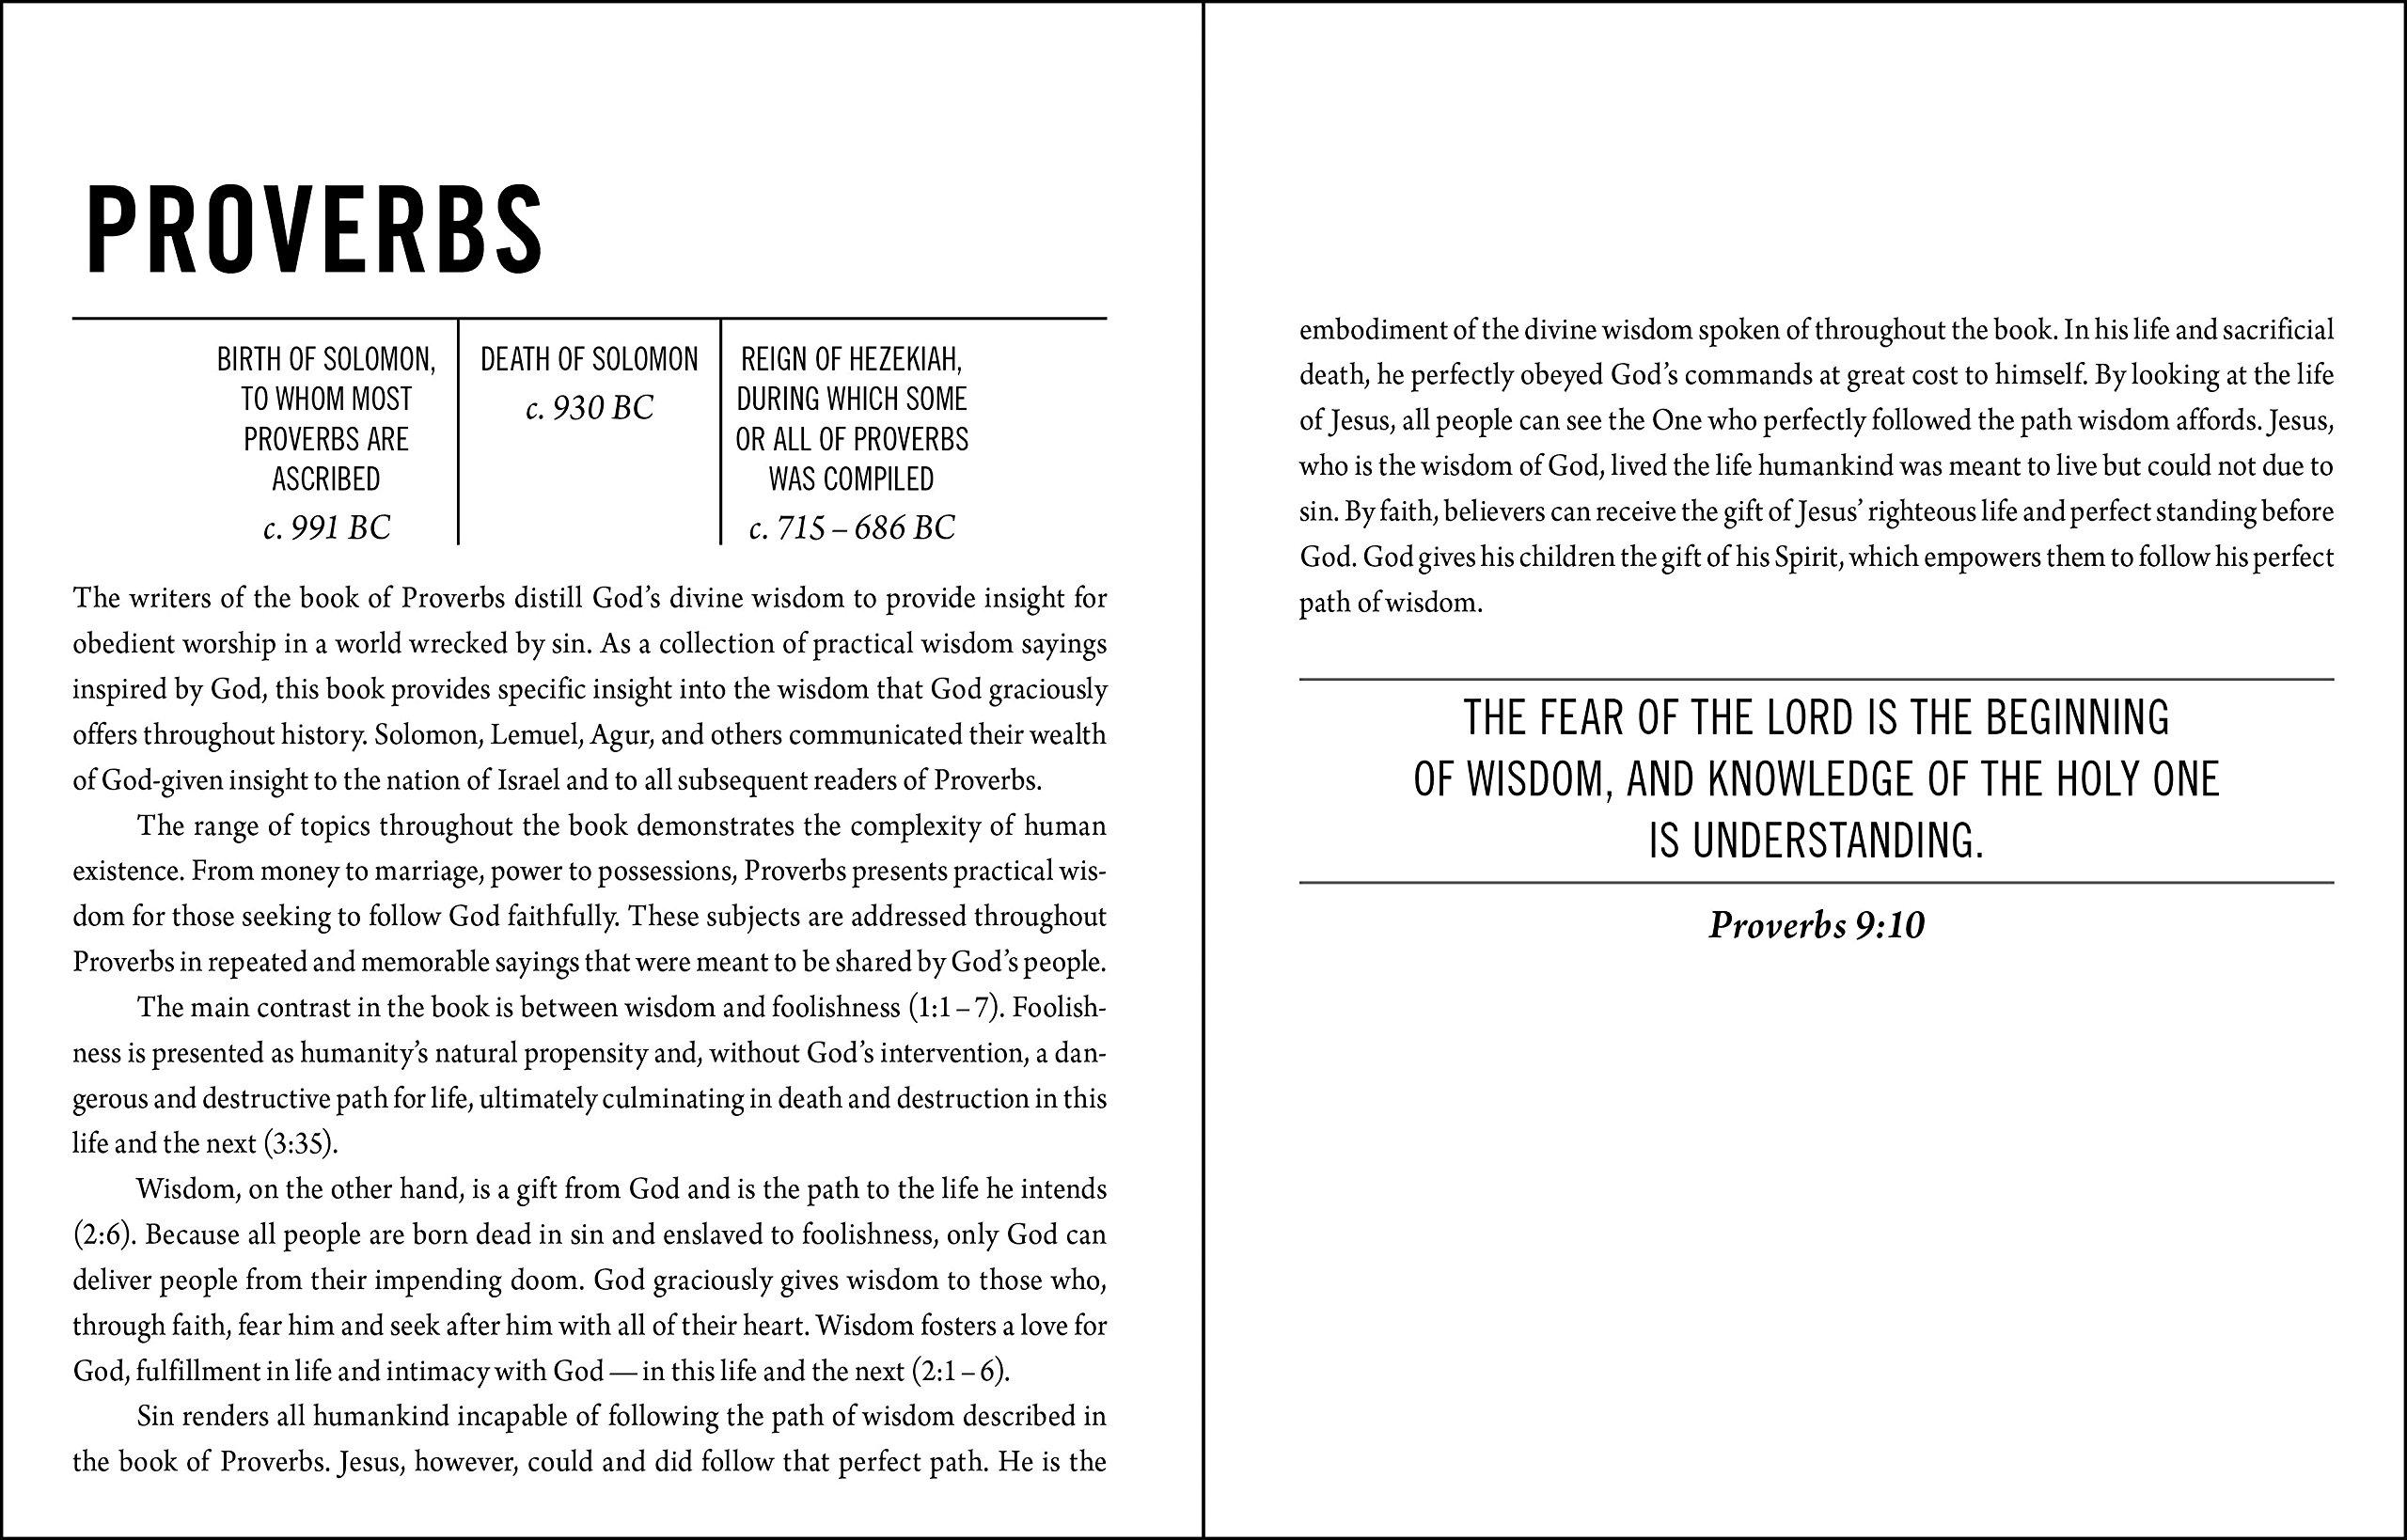 the jesus bible niv edition imitation leather brown passion